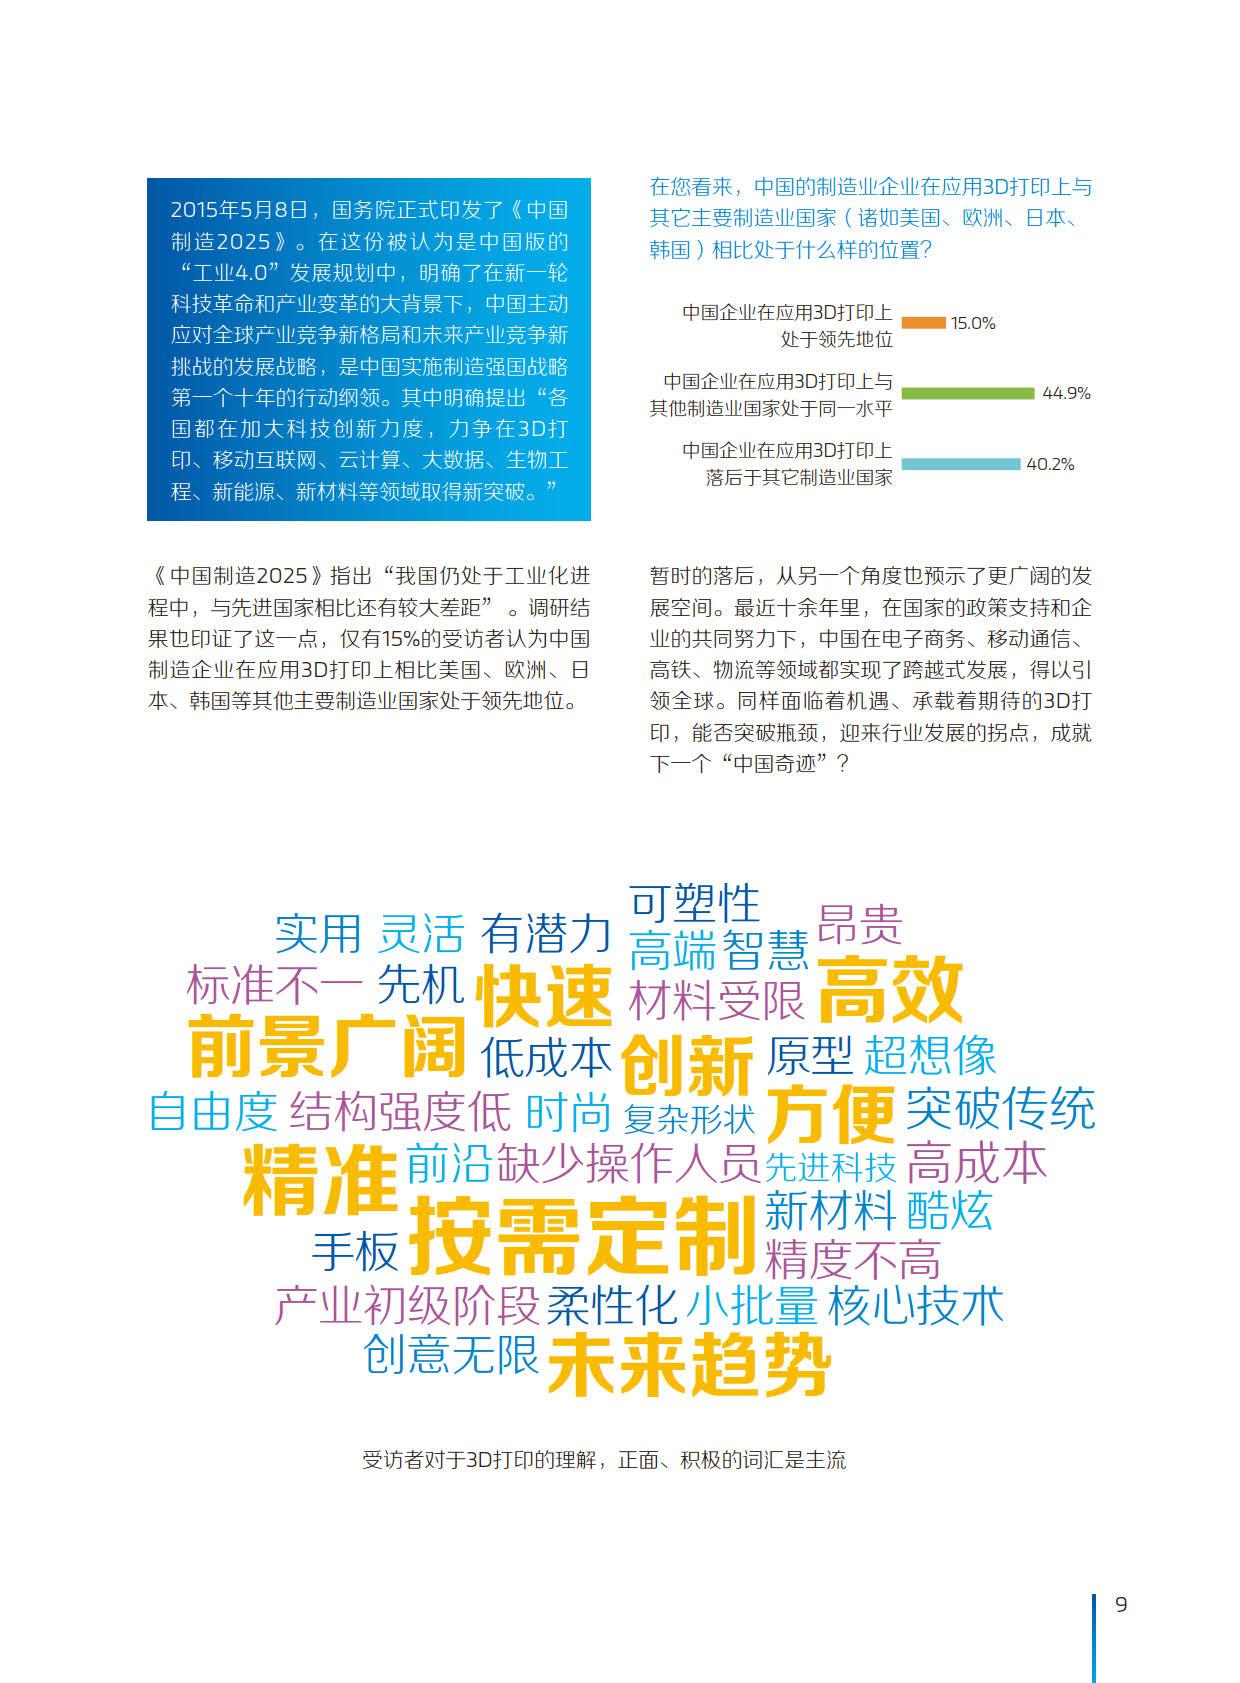 Materialise制造业调研报告_9.jpg